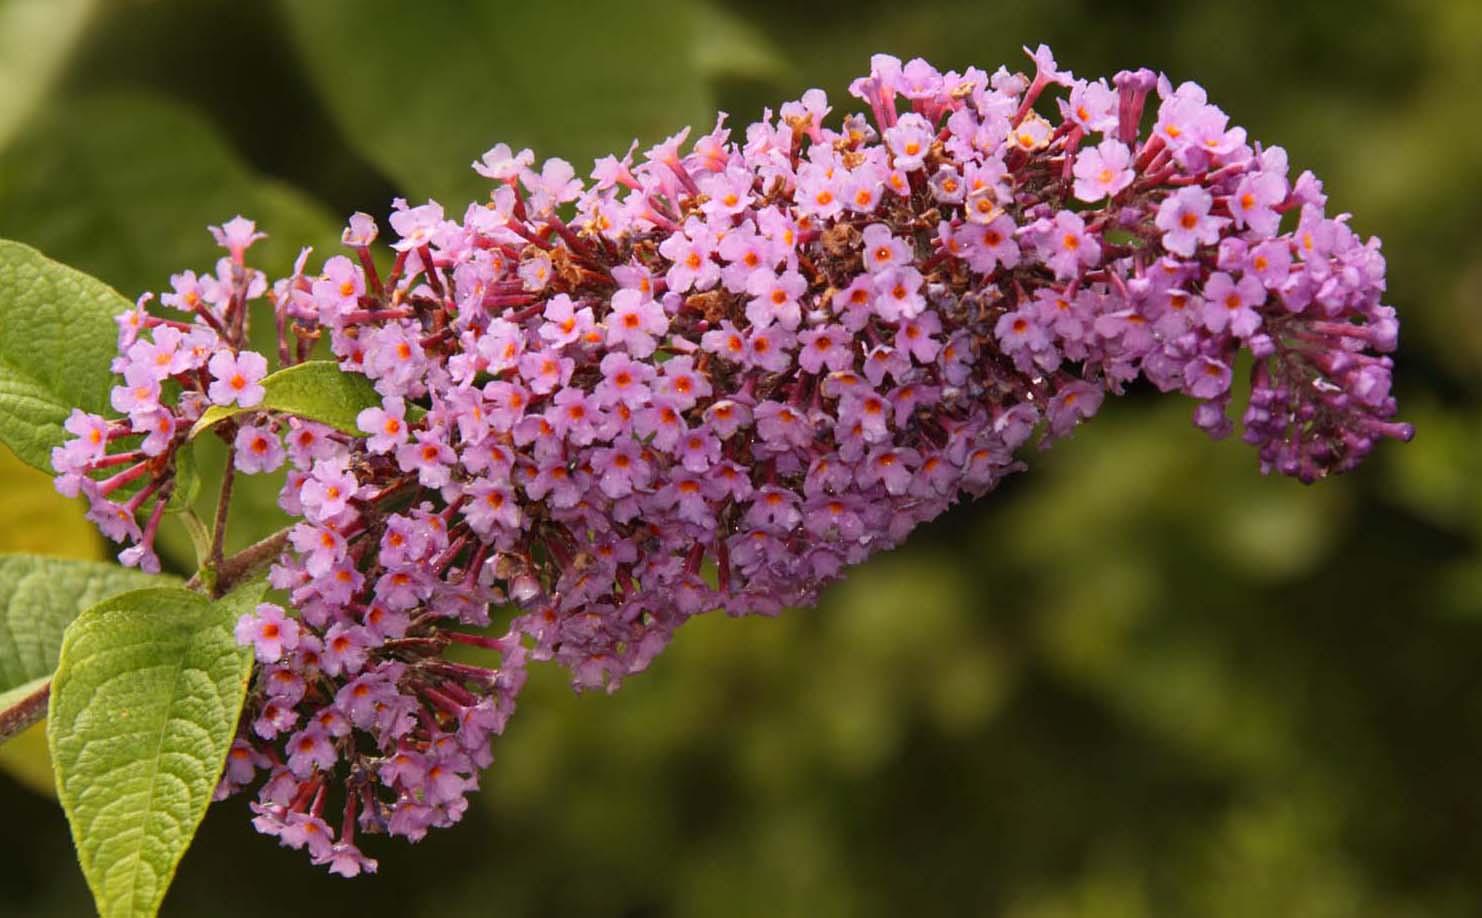 Buddleja davidii,purple Buddleia flower,365days,nature,natural,history,world,life,this photo rocks,plant,bloom,flower,flowers,flores,blome,hotpix!